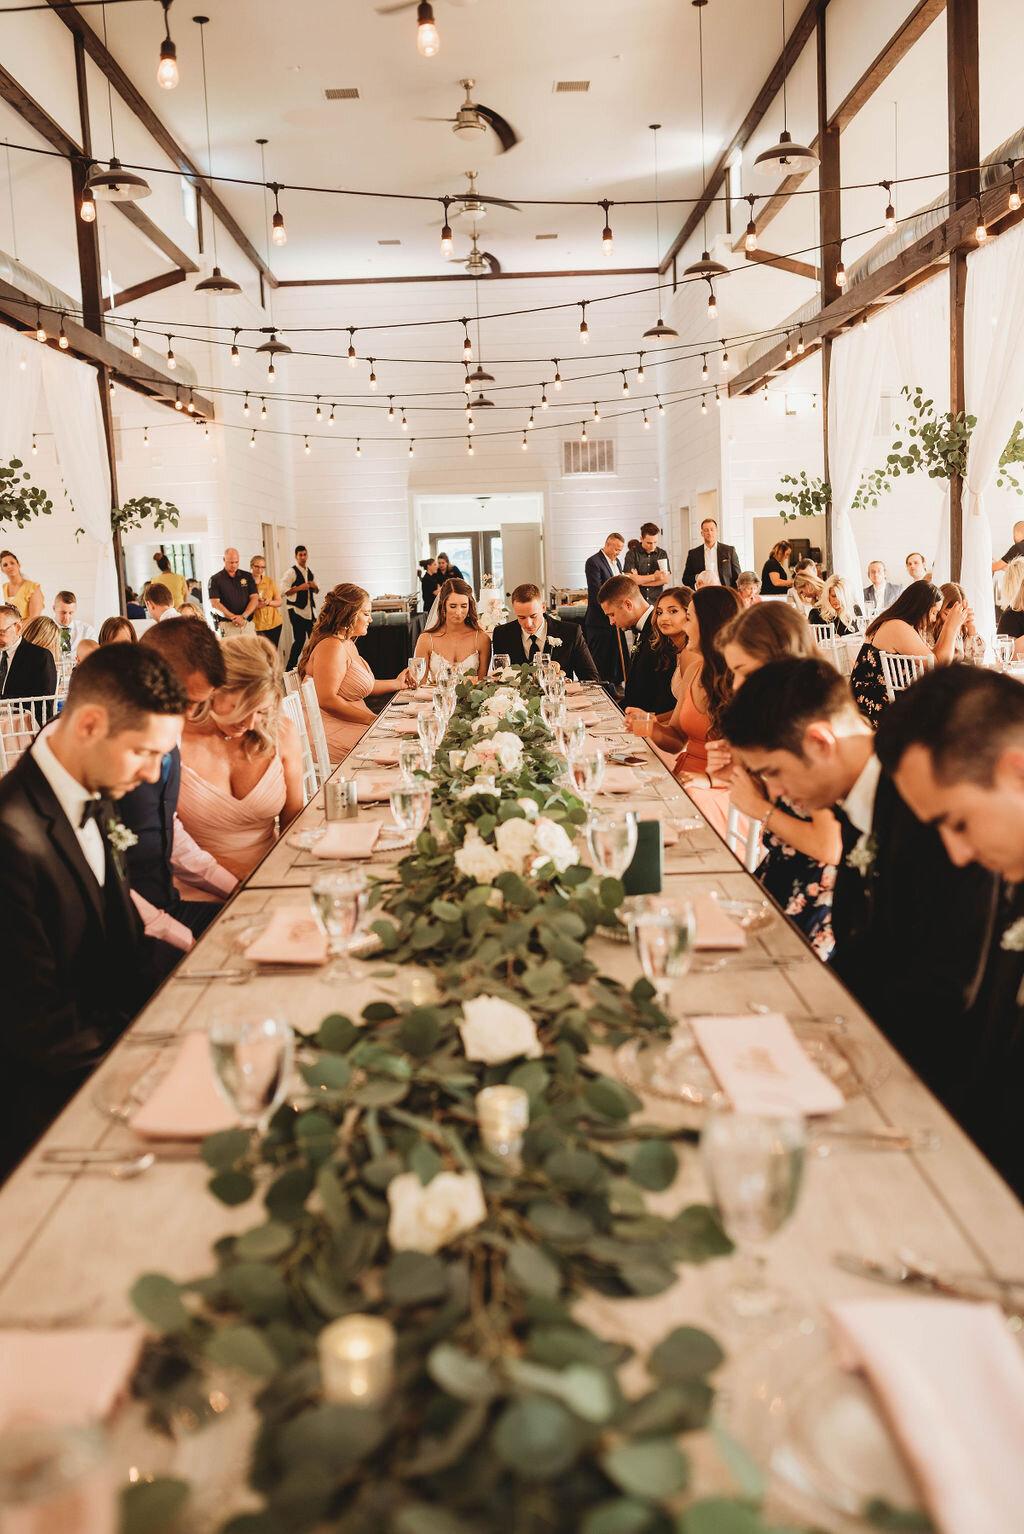 Tulsa Wedding Venue with a View 38.jpg